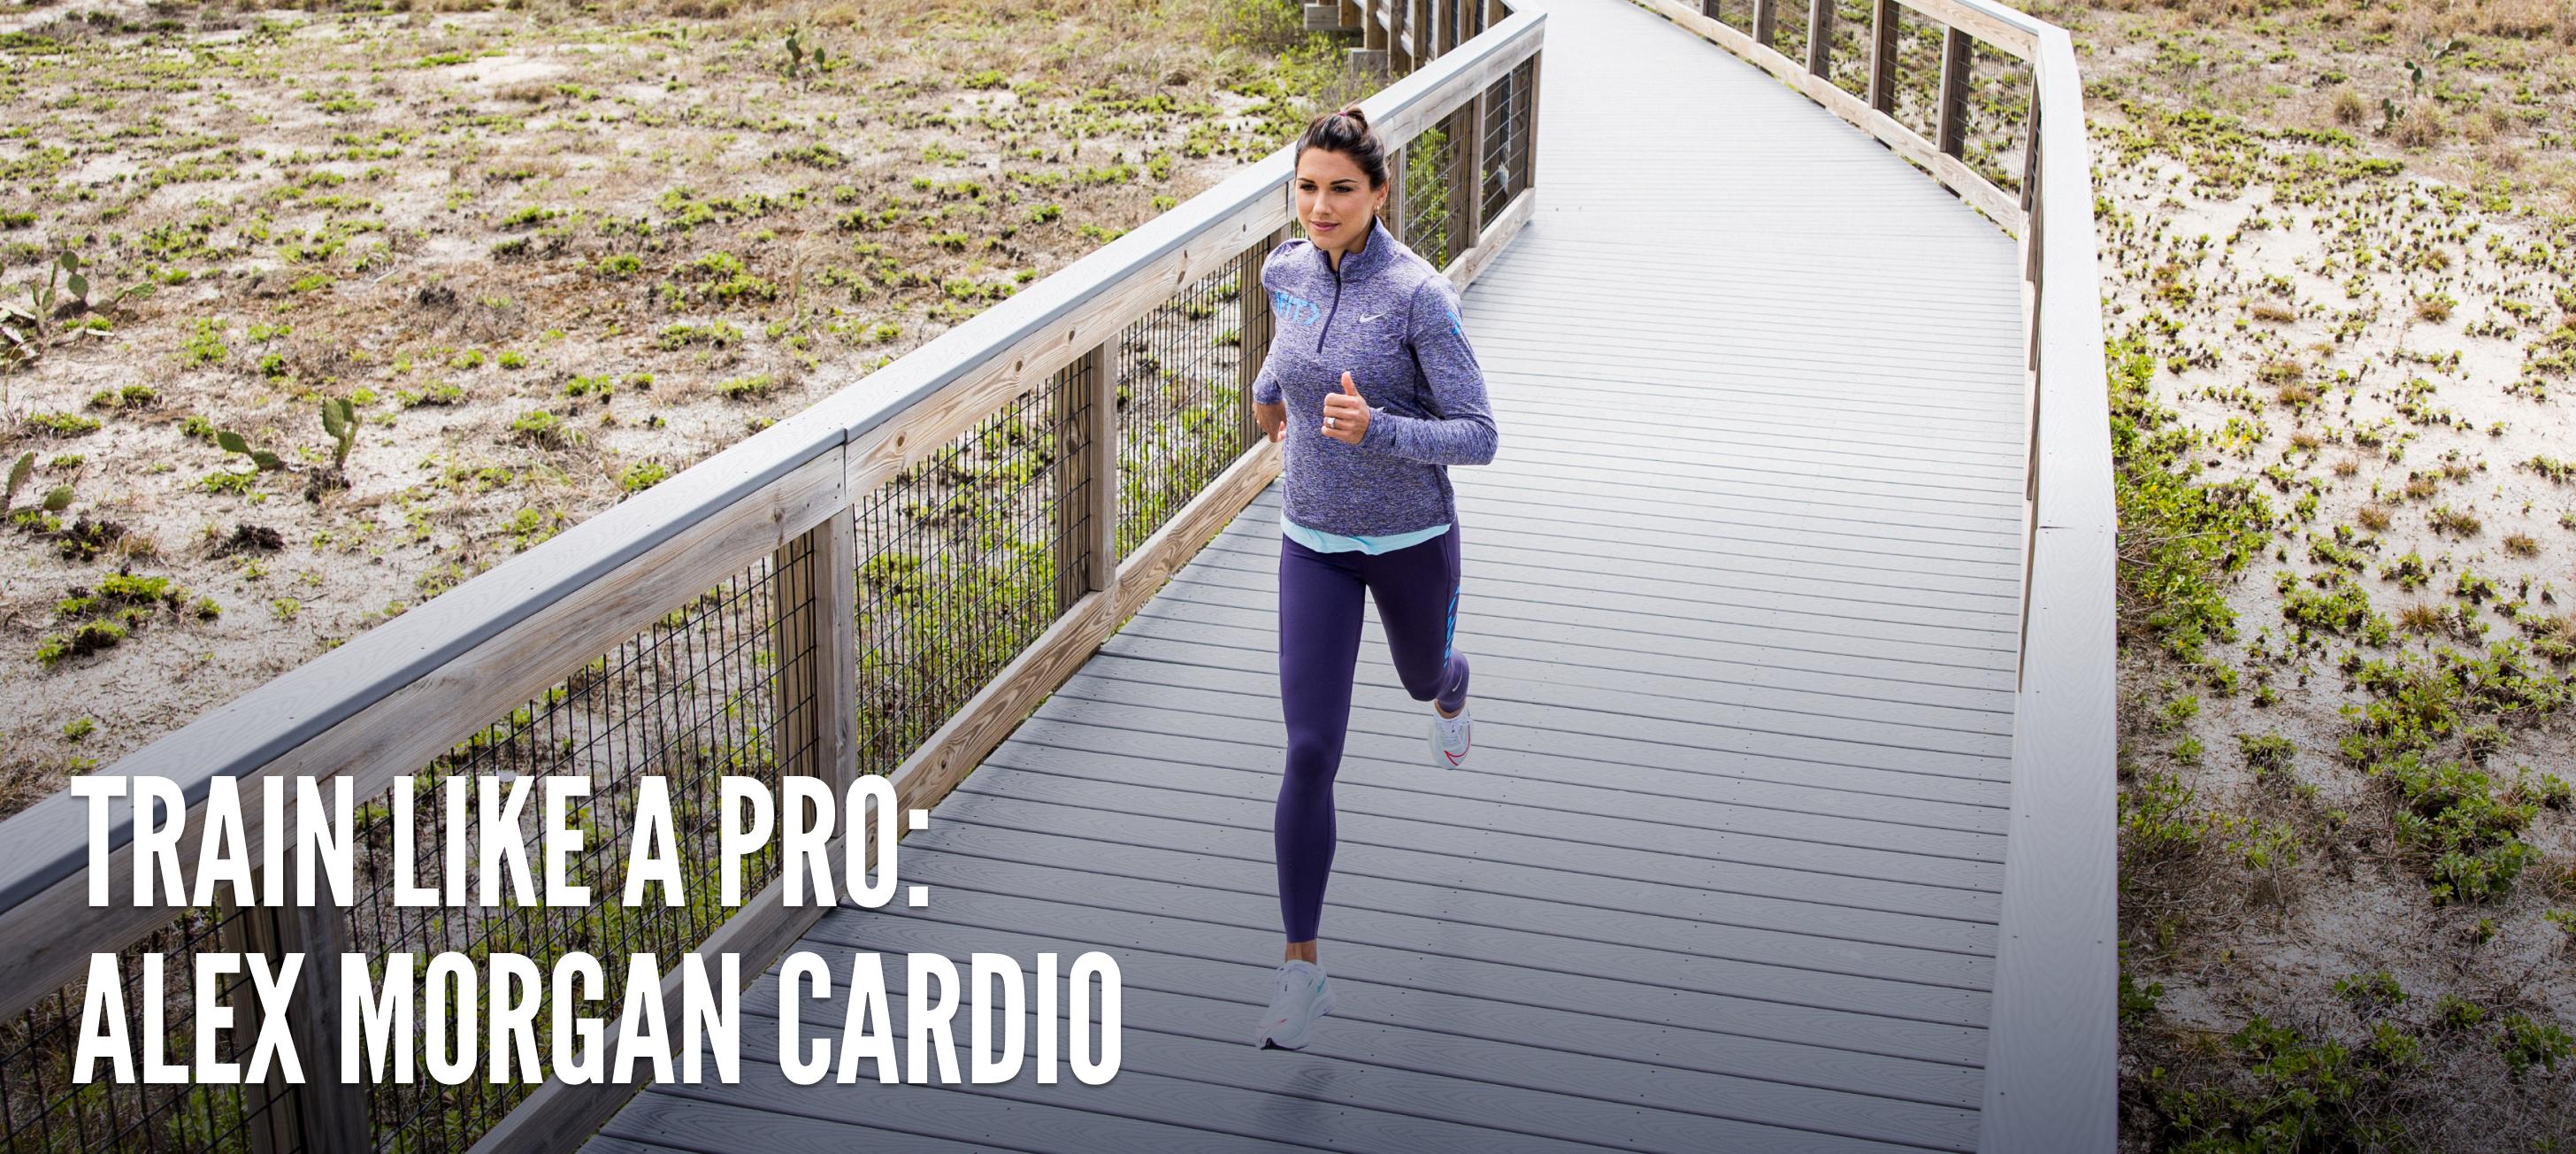 iFit Train Like a Pro: Alex Morgan cardio workouts